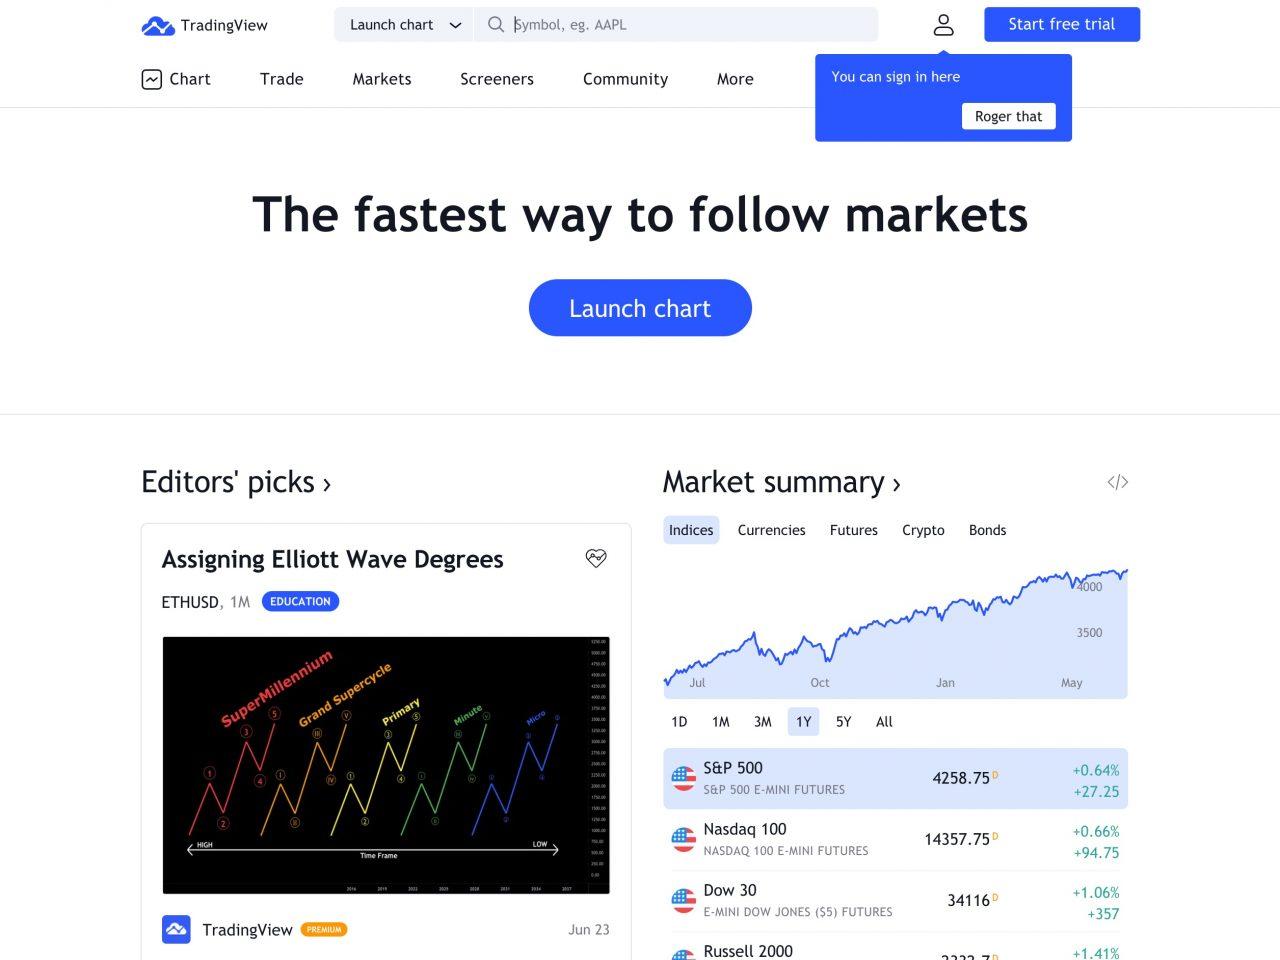 https://goodkarma.capital/wp-content/uploads/2021/06/TradingView-1280x960.jpg